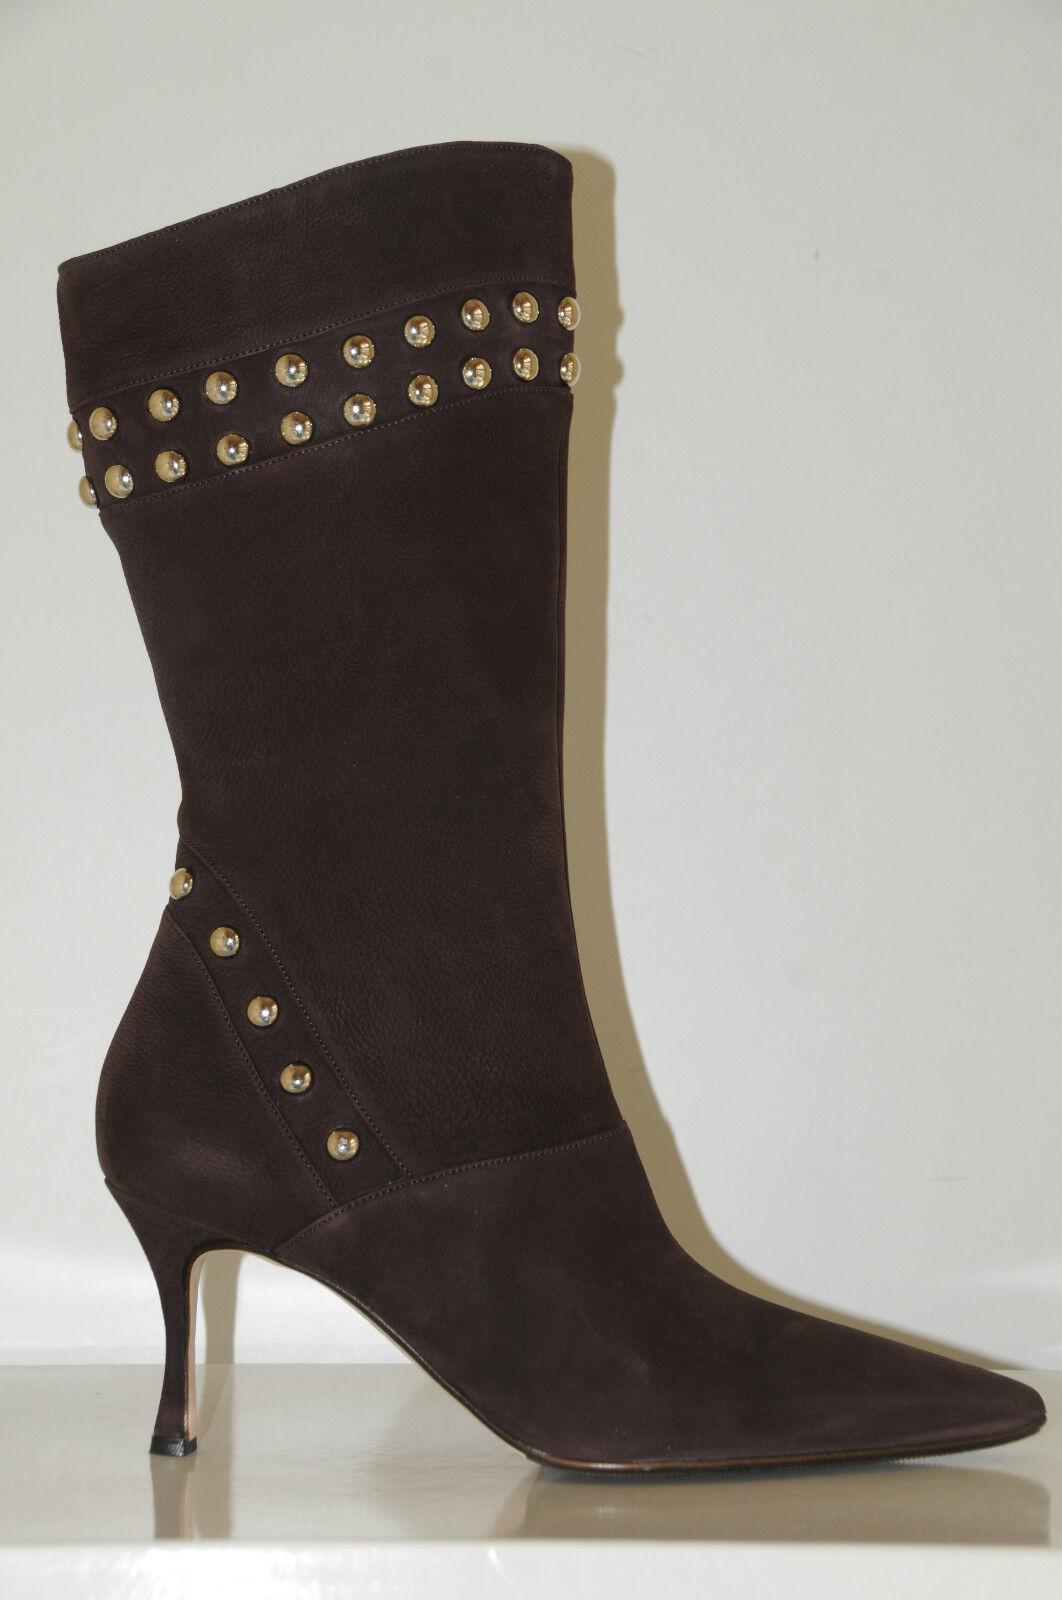 2175 New MANOLO BLAHNIK NENBIEMI PLUM marrón NUBUCK botas STUDS zapatos 41 10.5